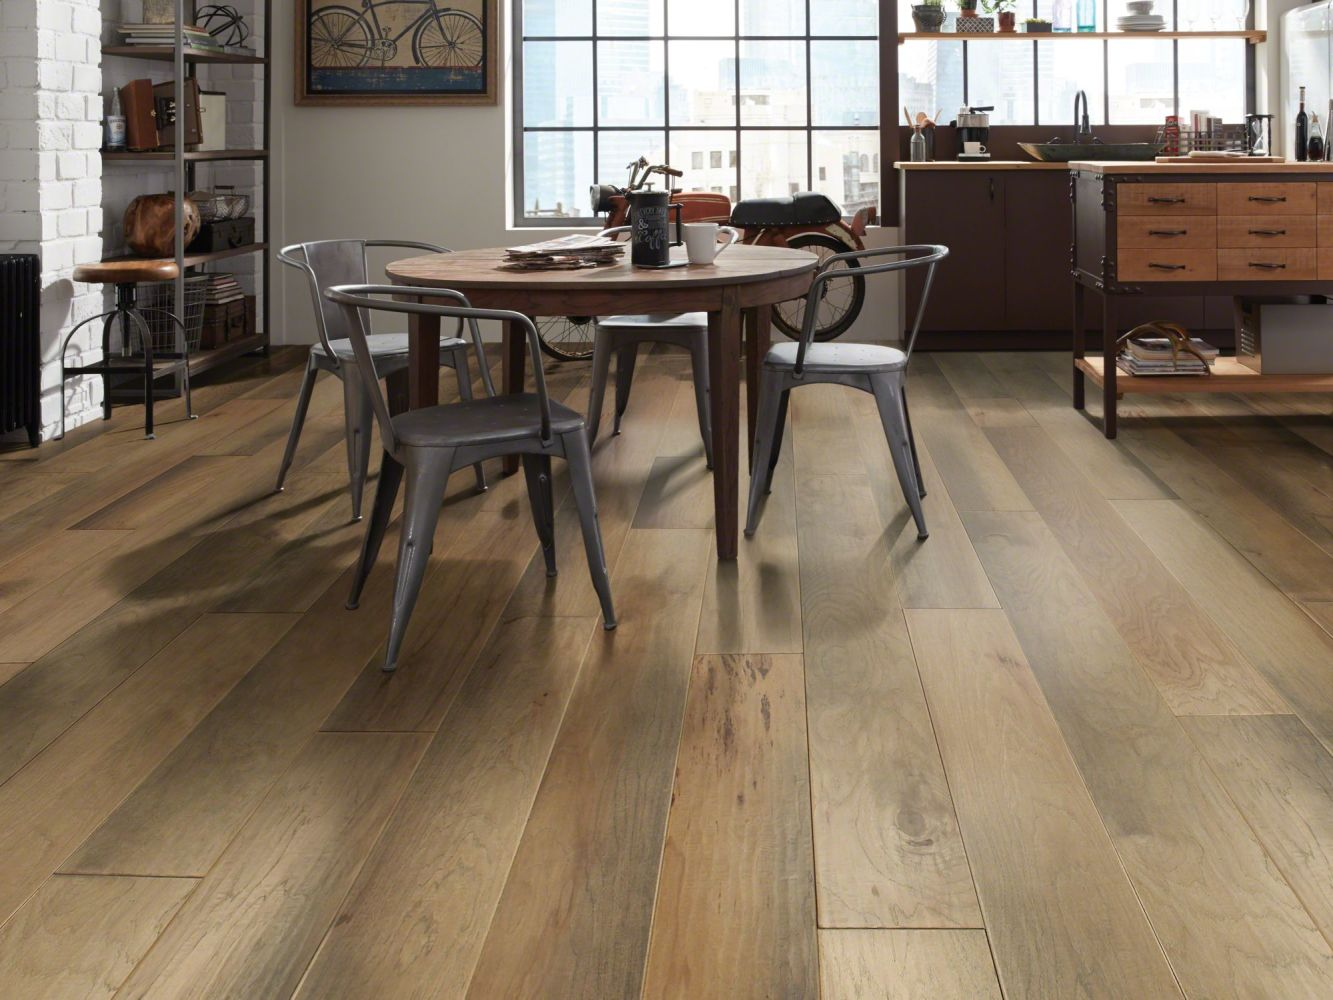 Shaw Floors Repel Hardwood Landmark Hickory Scraped Alamo 11022_SW597